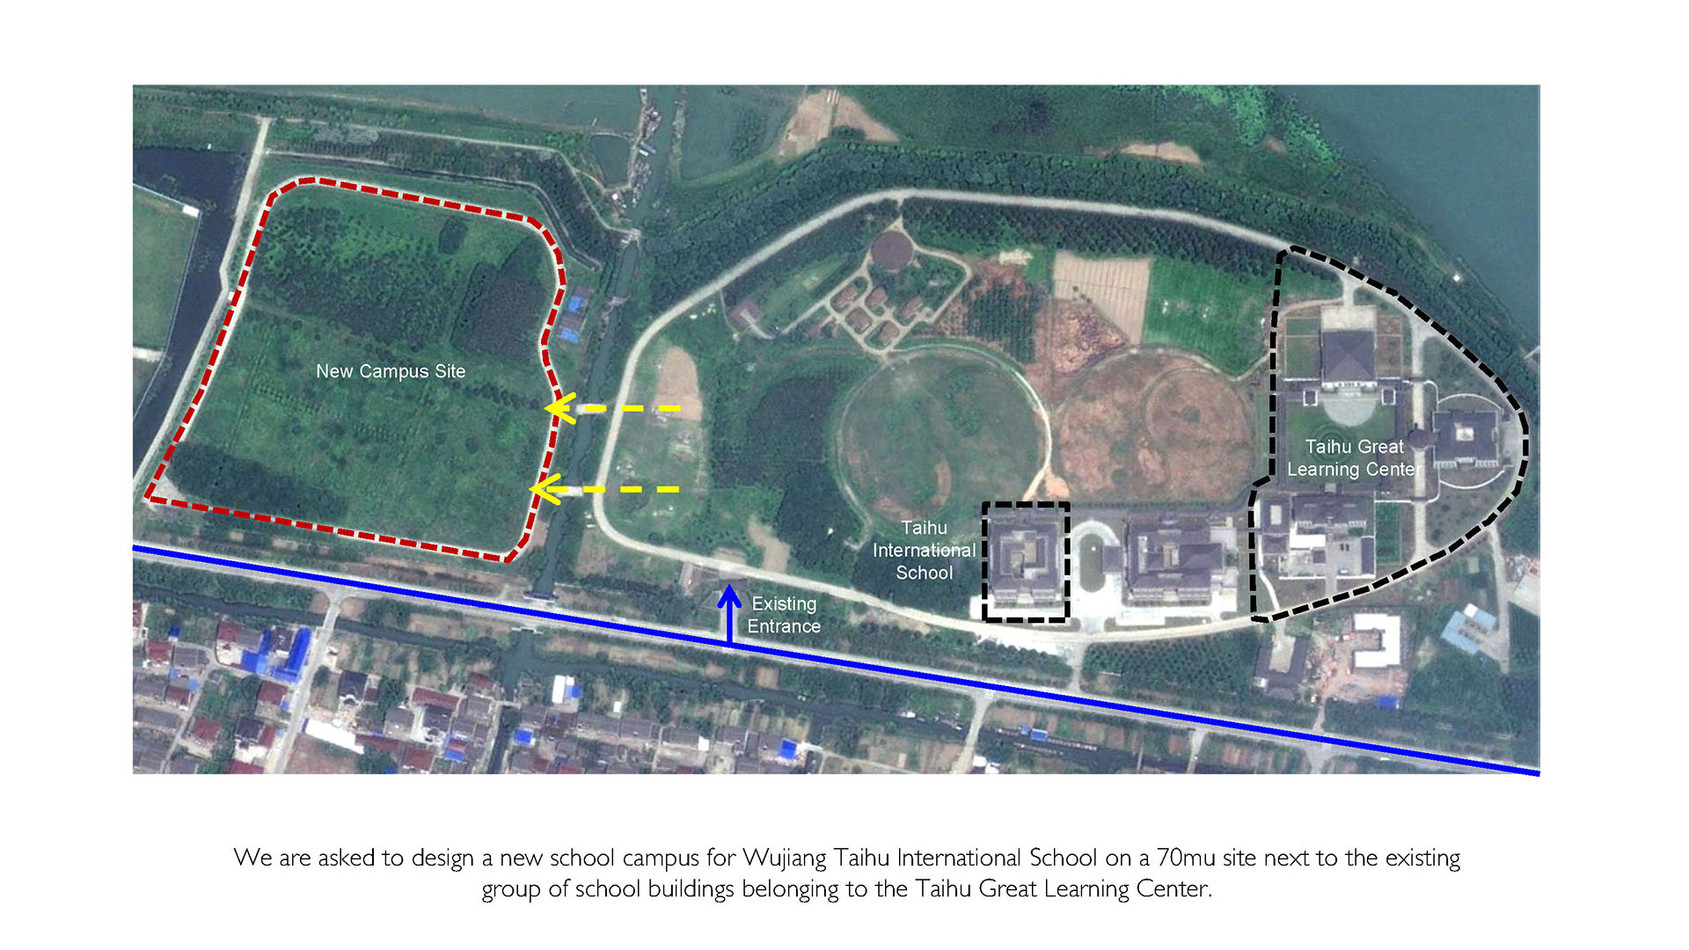 TAIHU-INTERNATIONAL-SCHOOL-CAMPUS-EN 01.